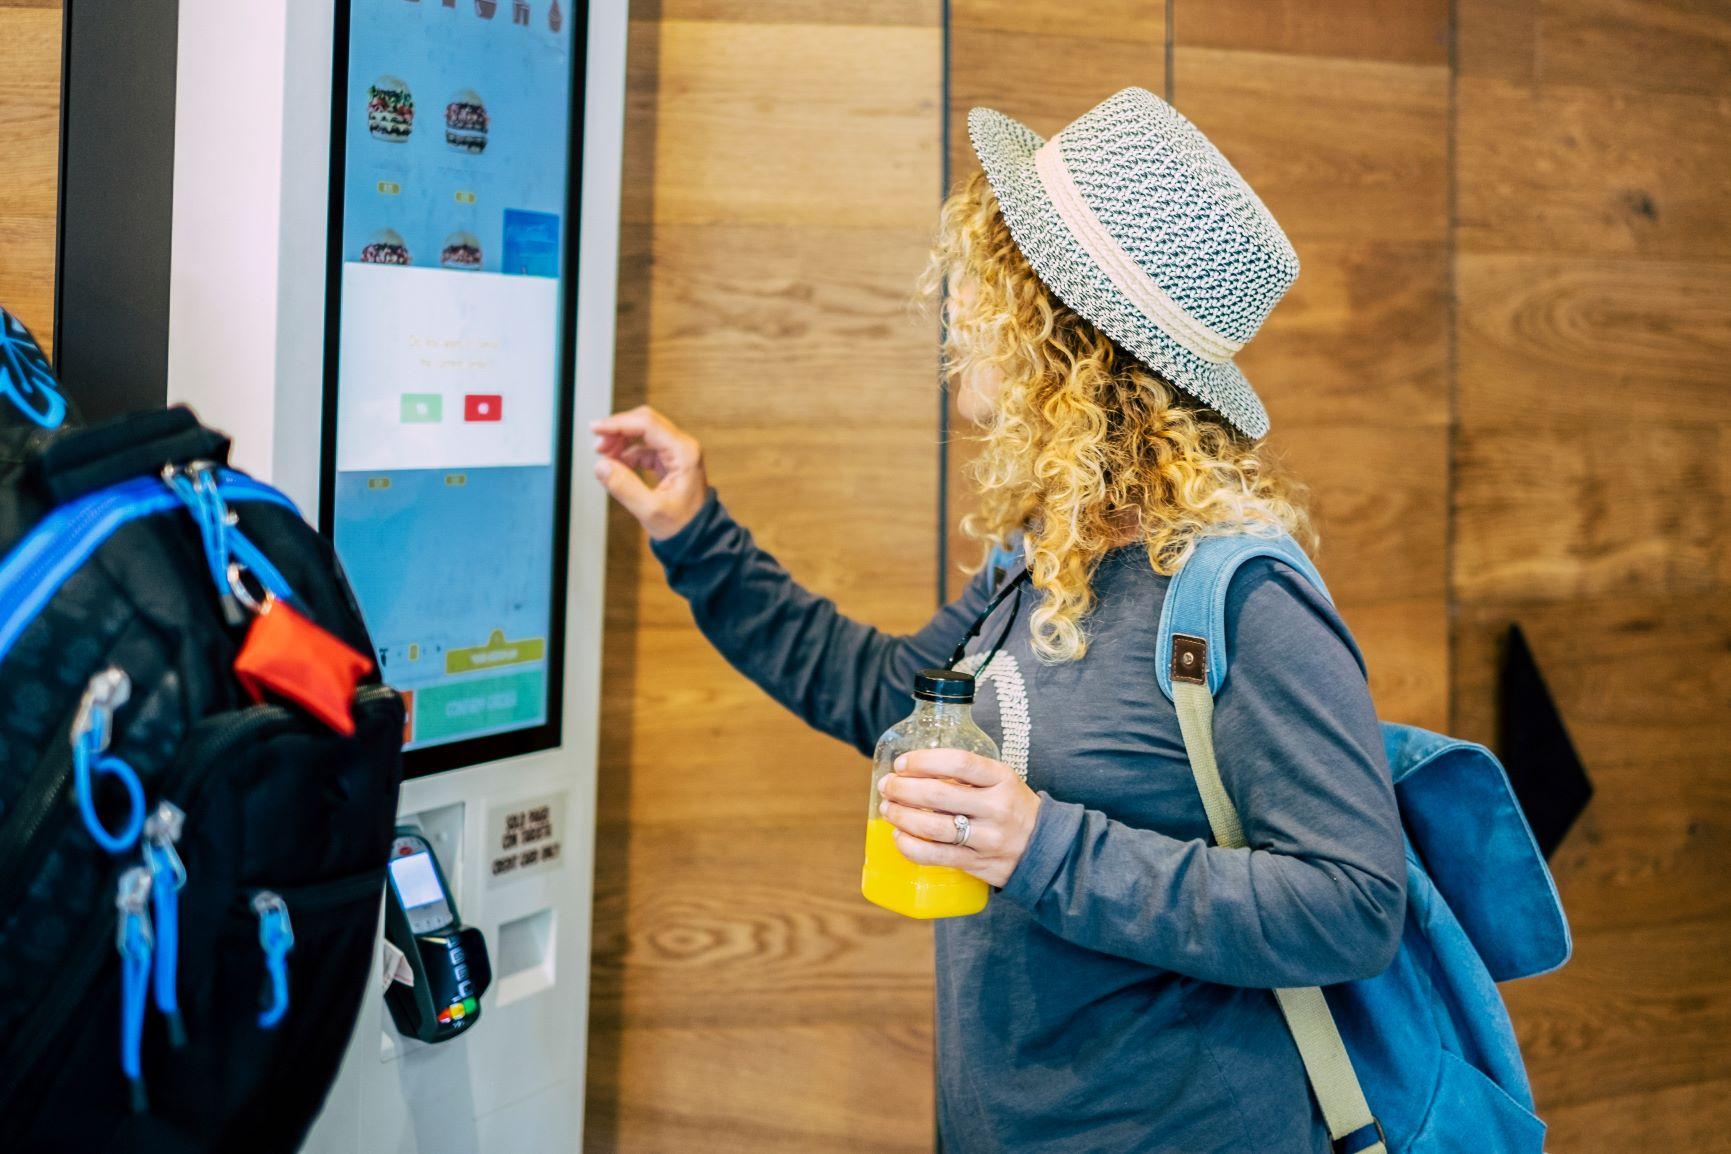 Digital screen at fast food restaurant